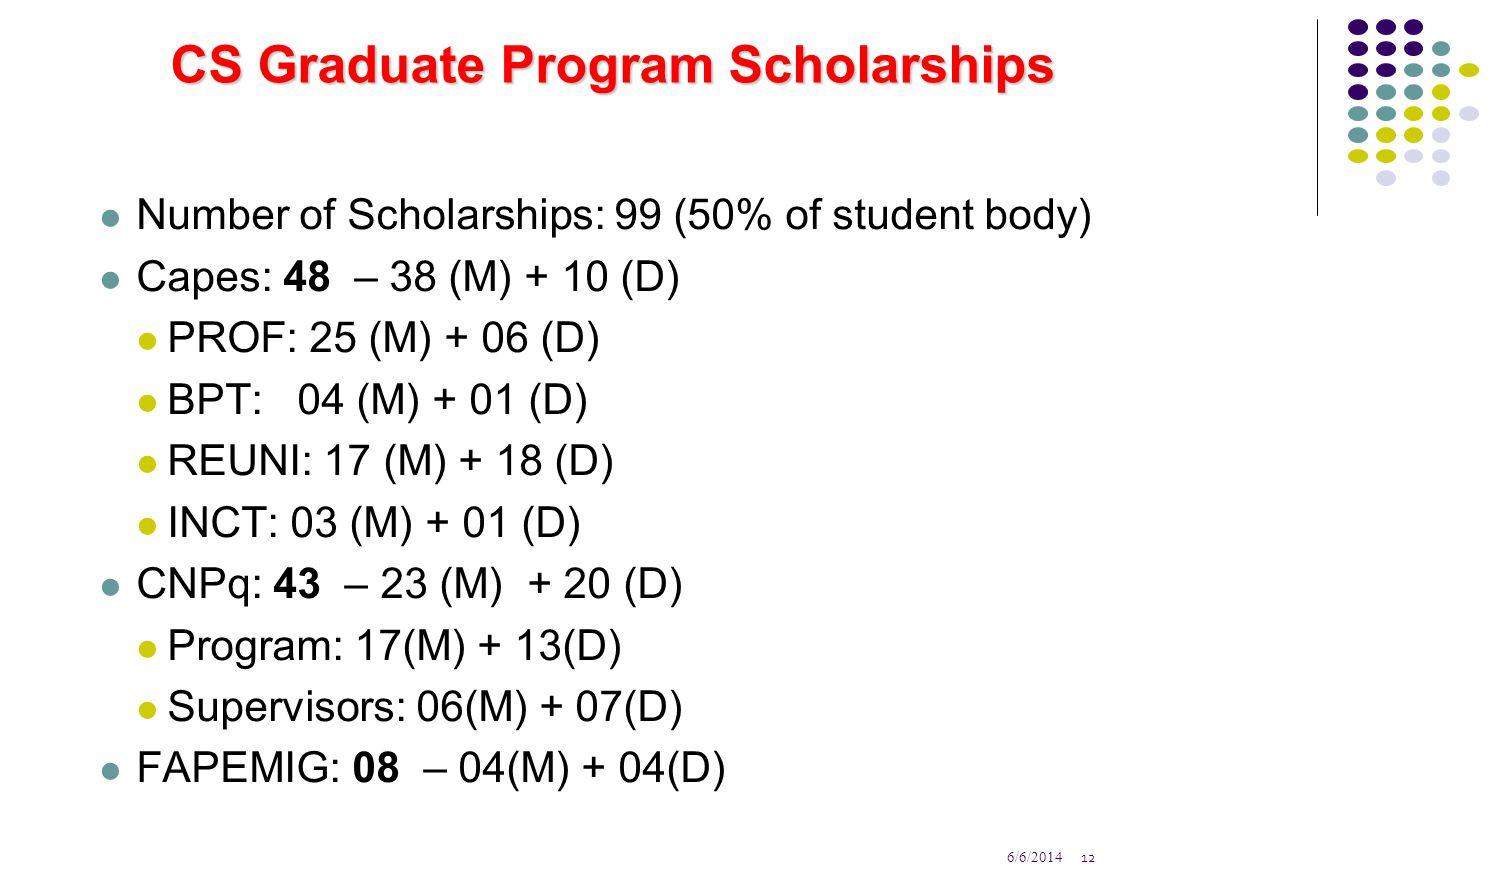 12 6/6/2014 CS Graduate Program Scholarships Number of Scholarships: 99 (50% of student body) Capes: 48 – 38 (M) + 10 (D) PROF: 25 (M) + 06 (D) BPT: 0